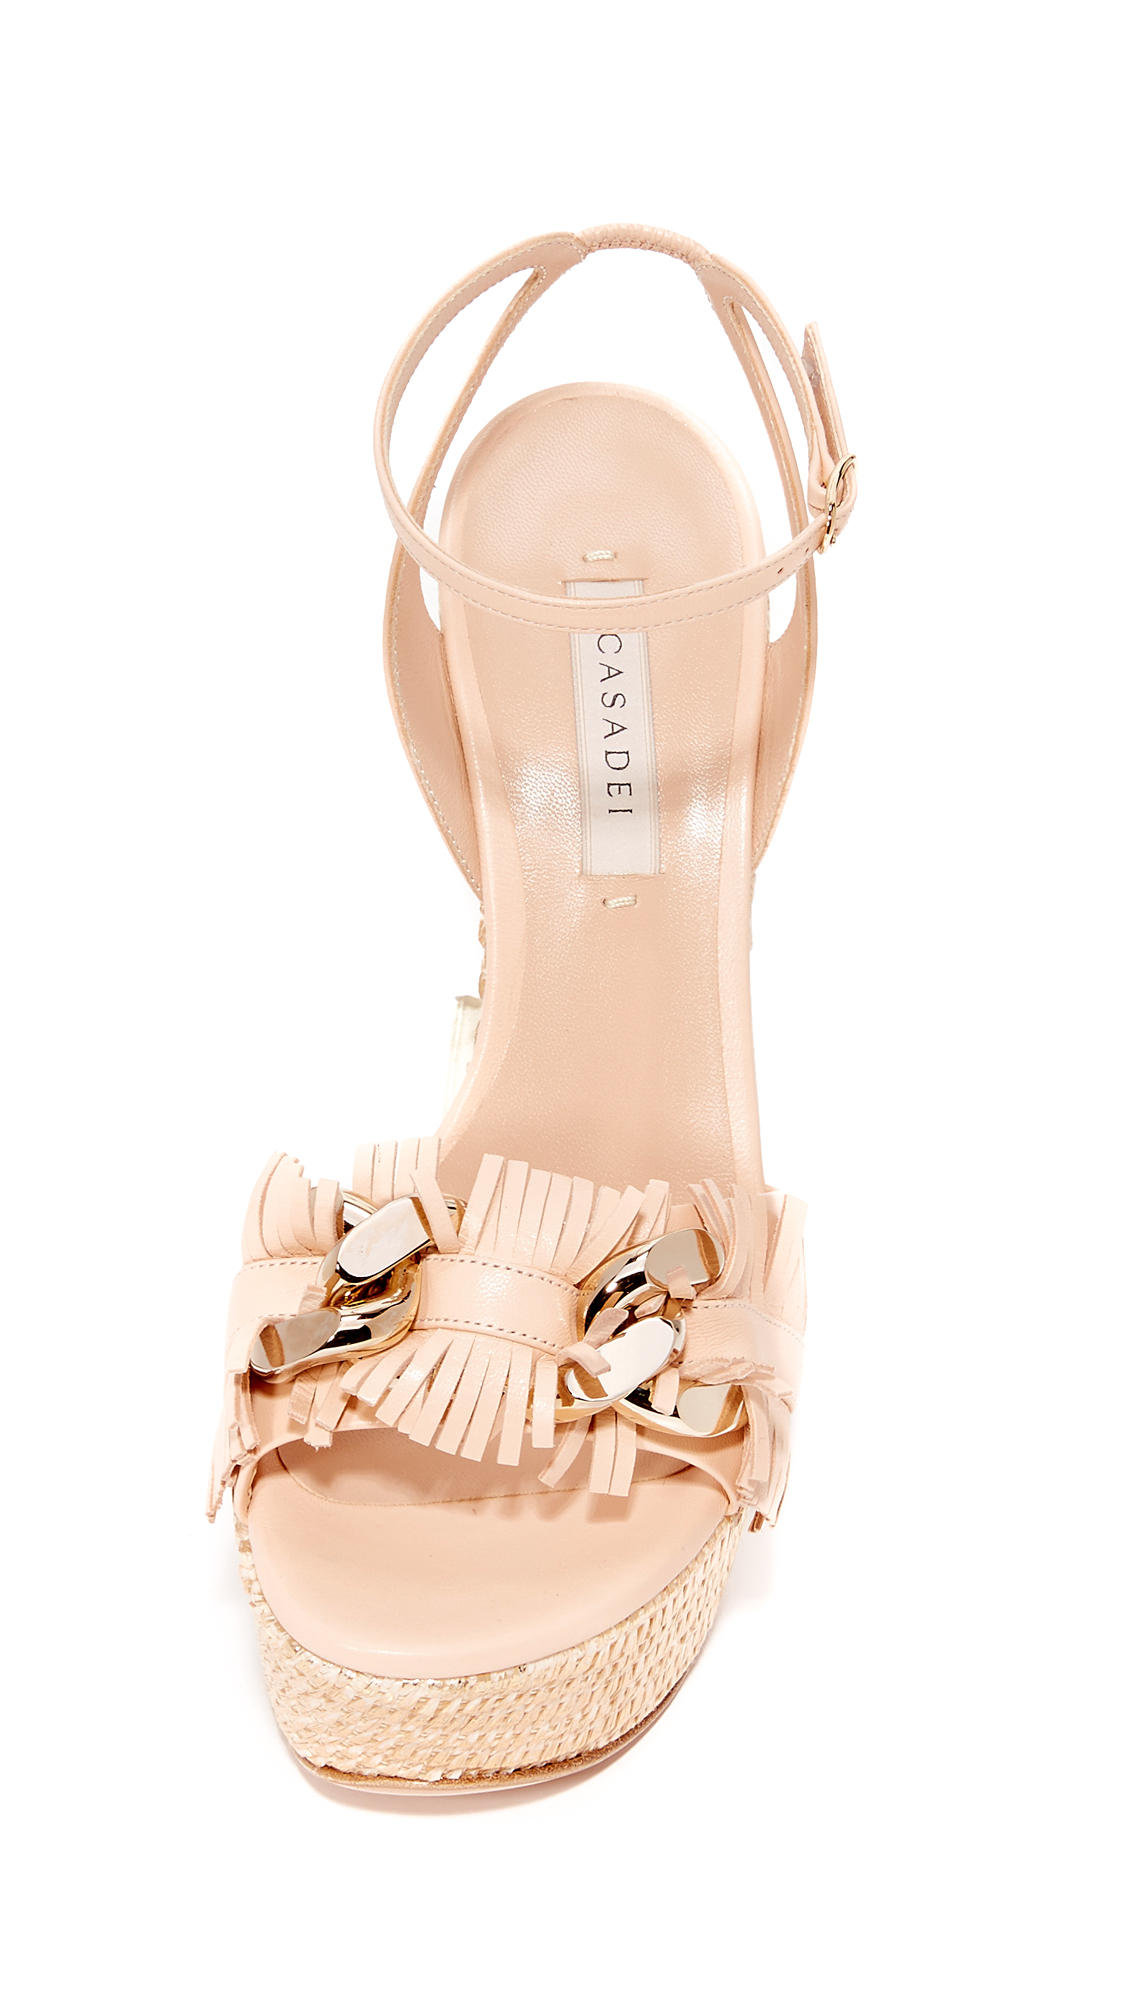 48124780114c Casadei Jeweled Wedge Sandals